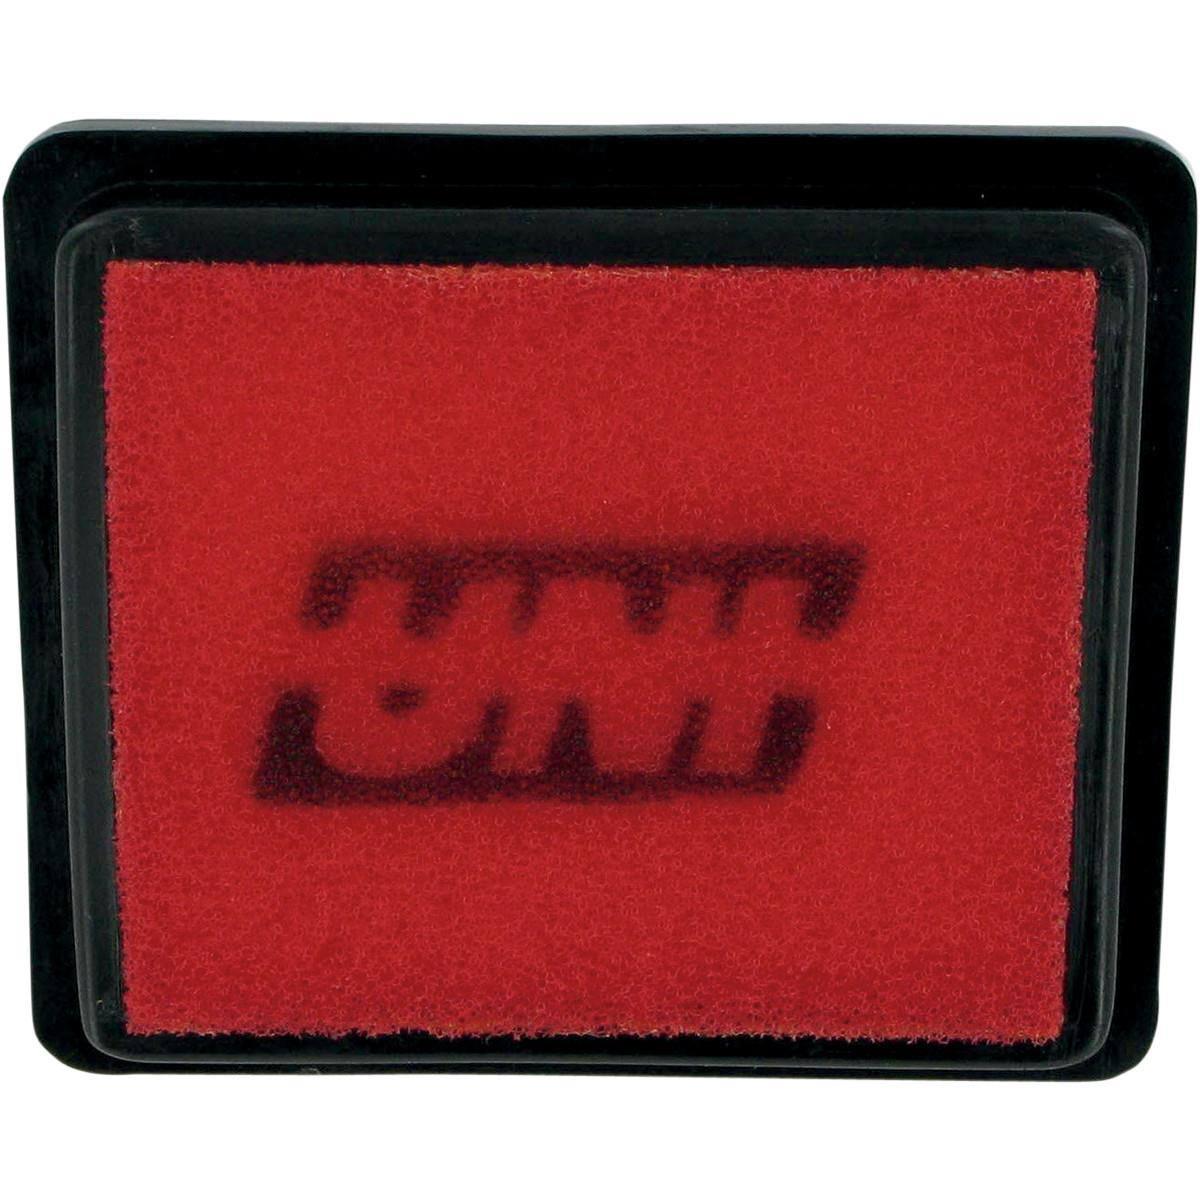 UNI Air Filters NU-8950 Air Filter For 2006 Vespa GTS 250